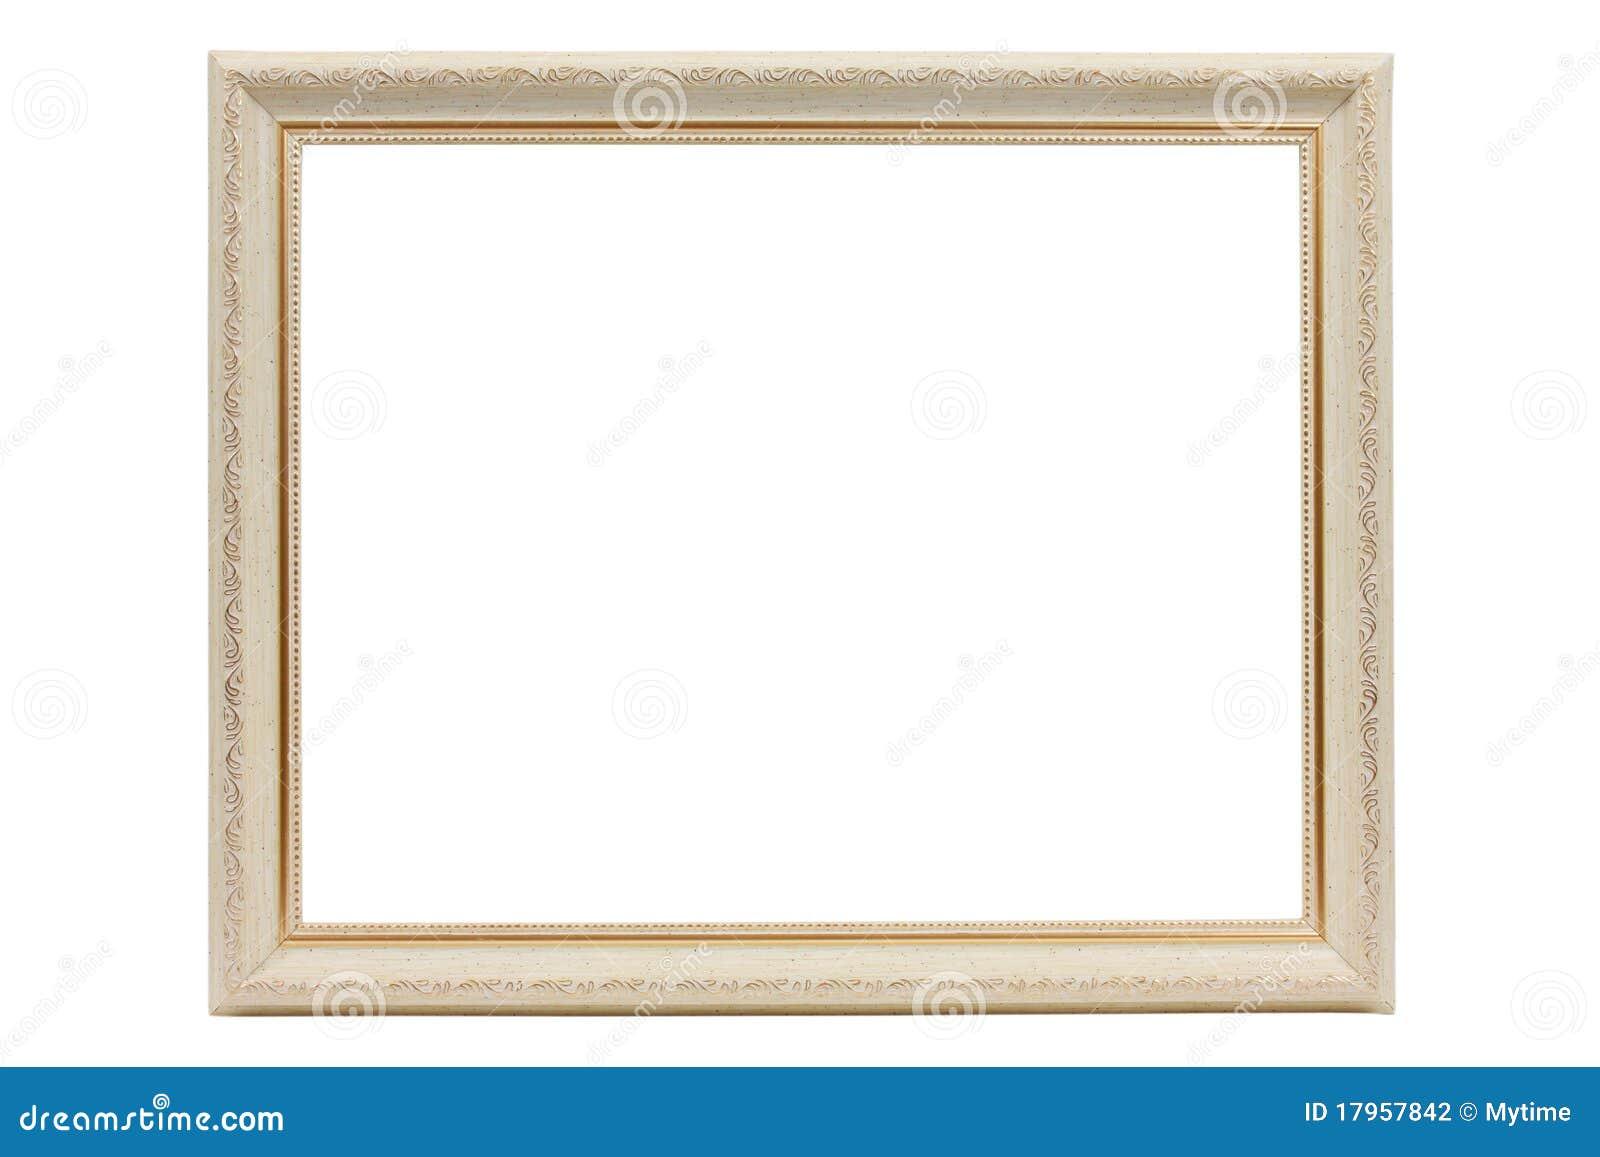 Vintage White Frame : Vintage white frame on white background.